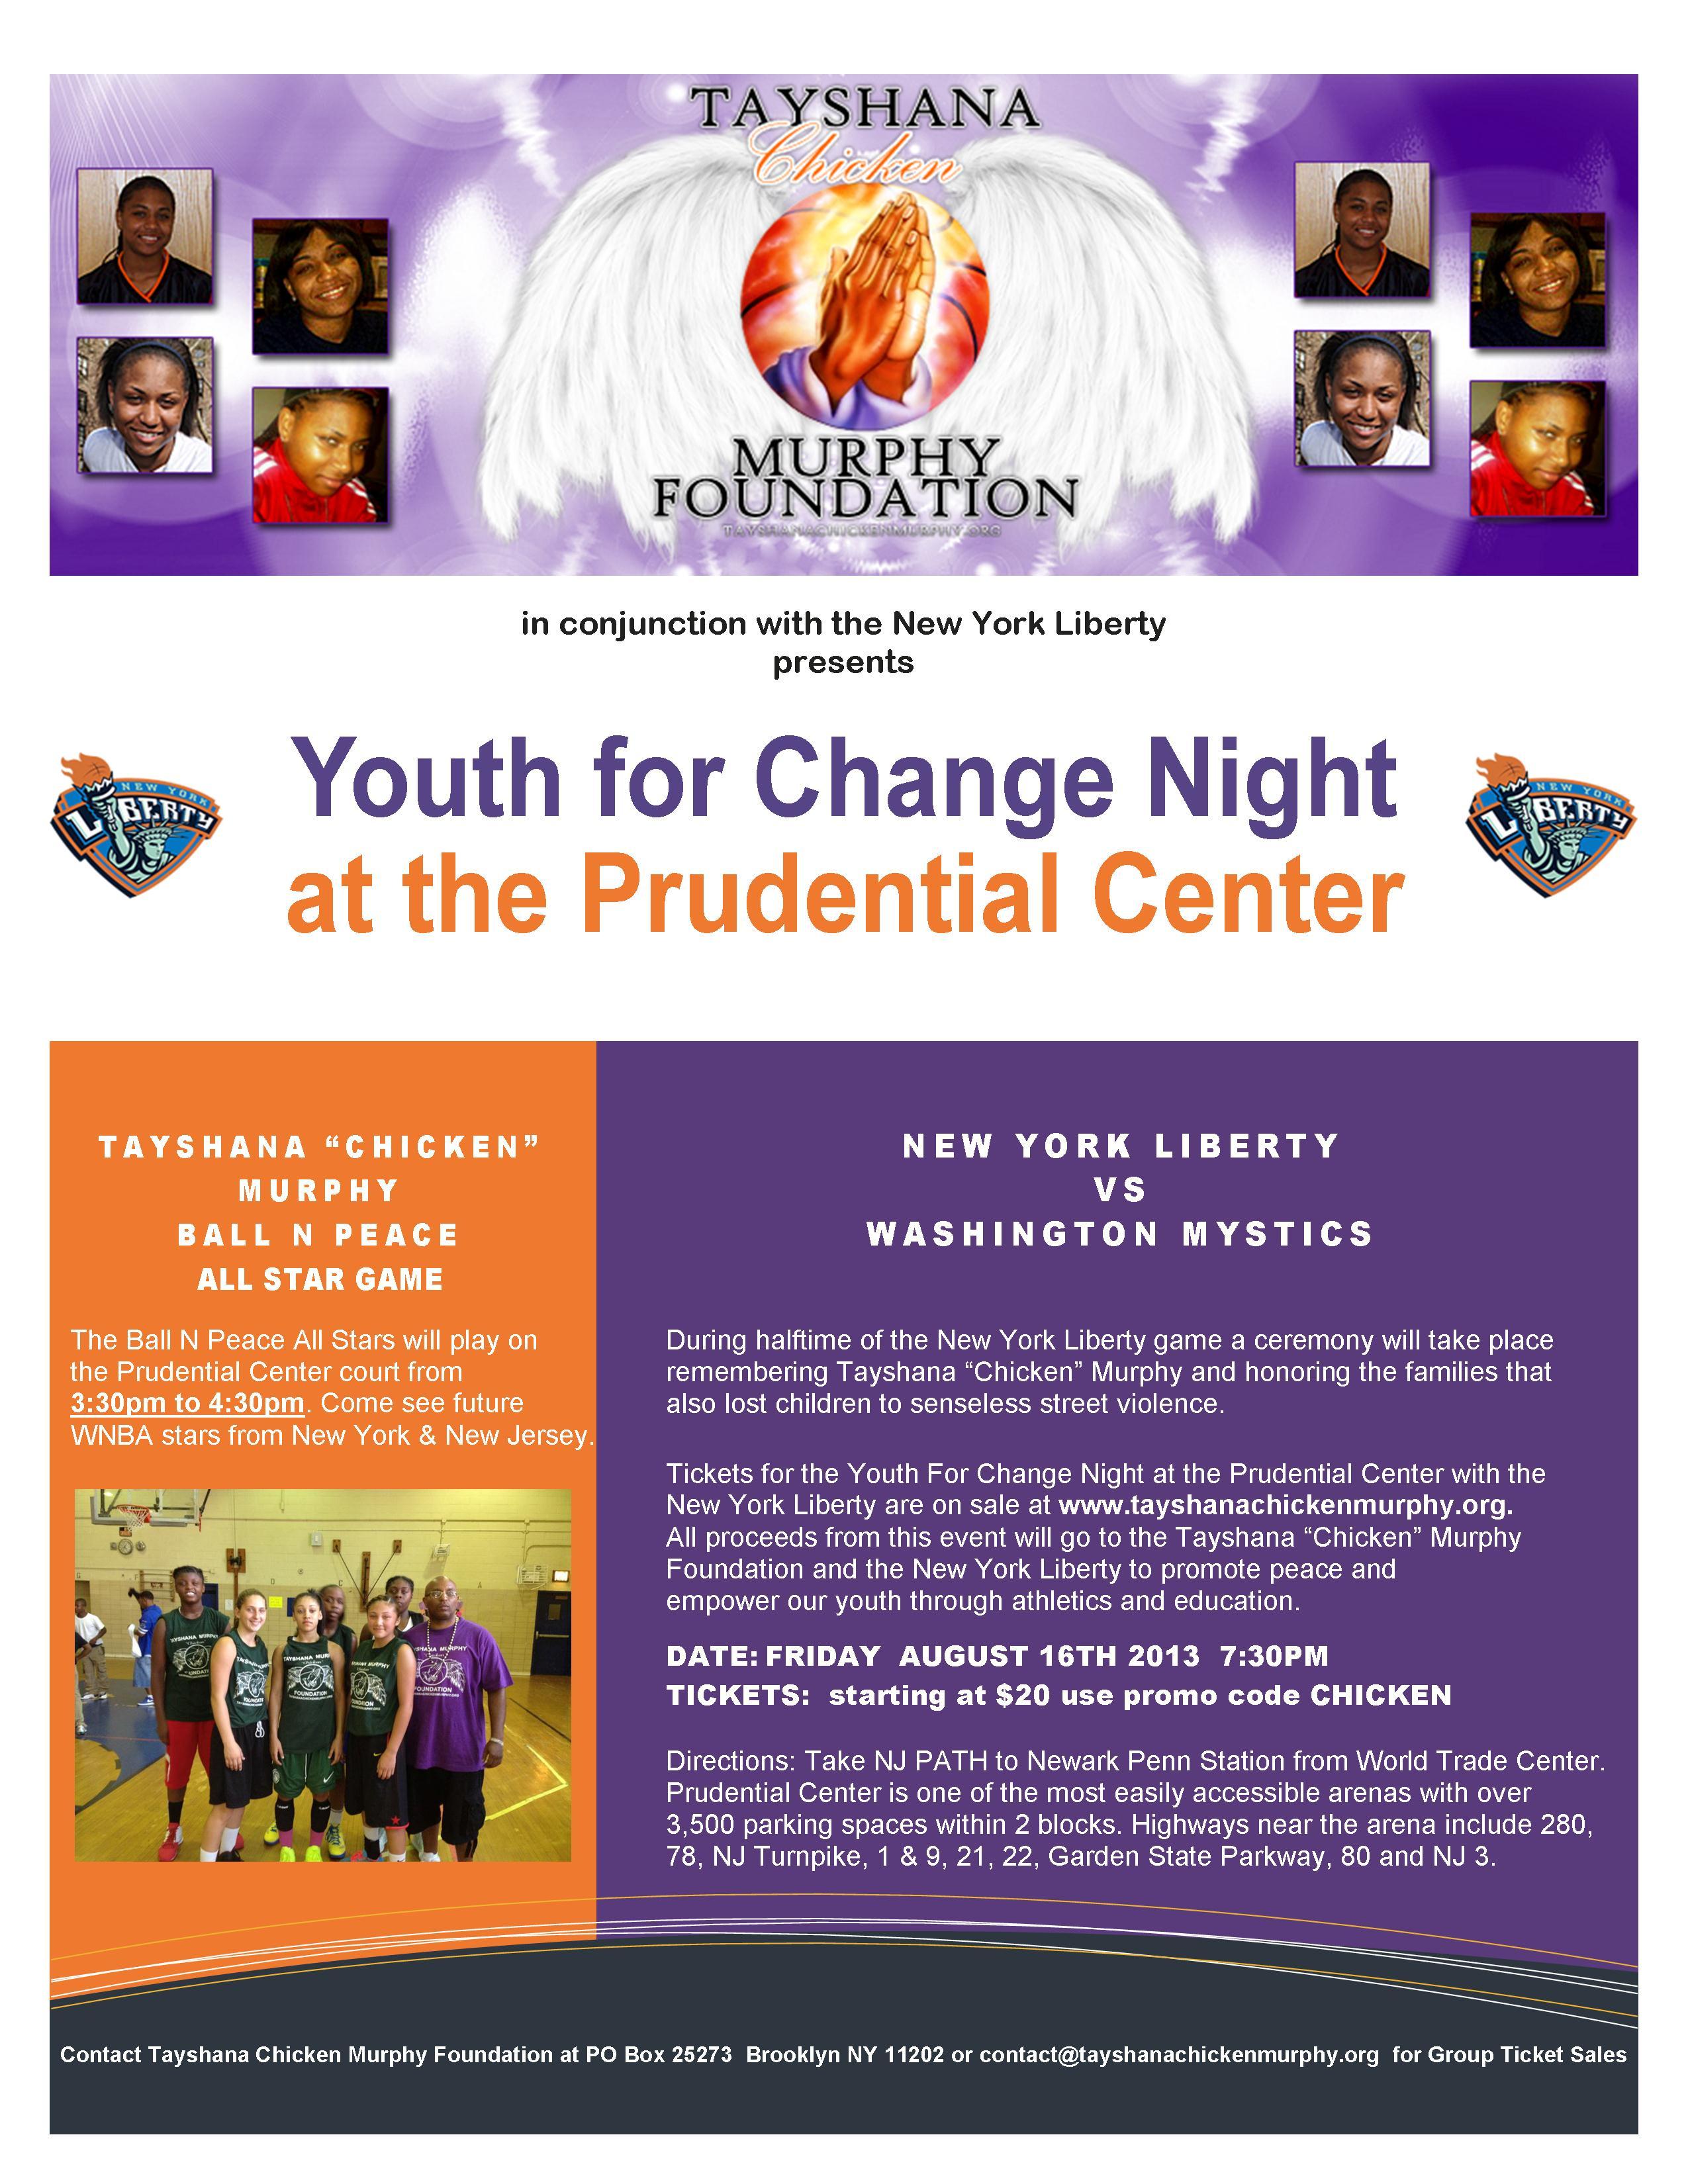 NYL-2013-TayshanaMurphyFoundation-Youth-for-Change-Night